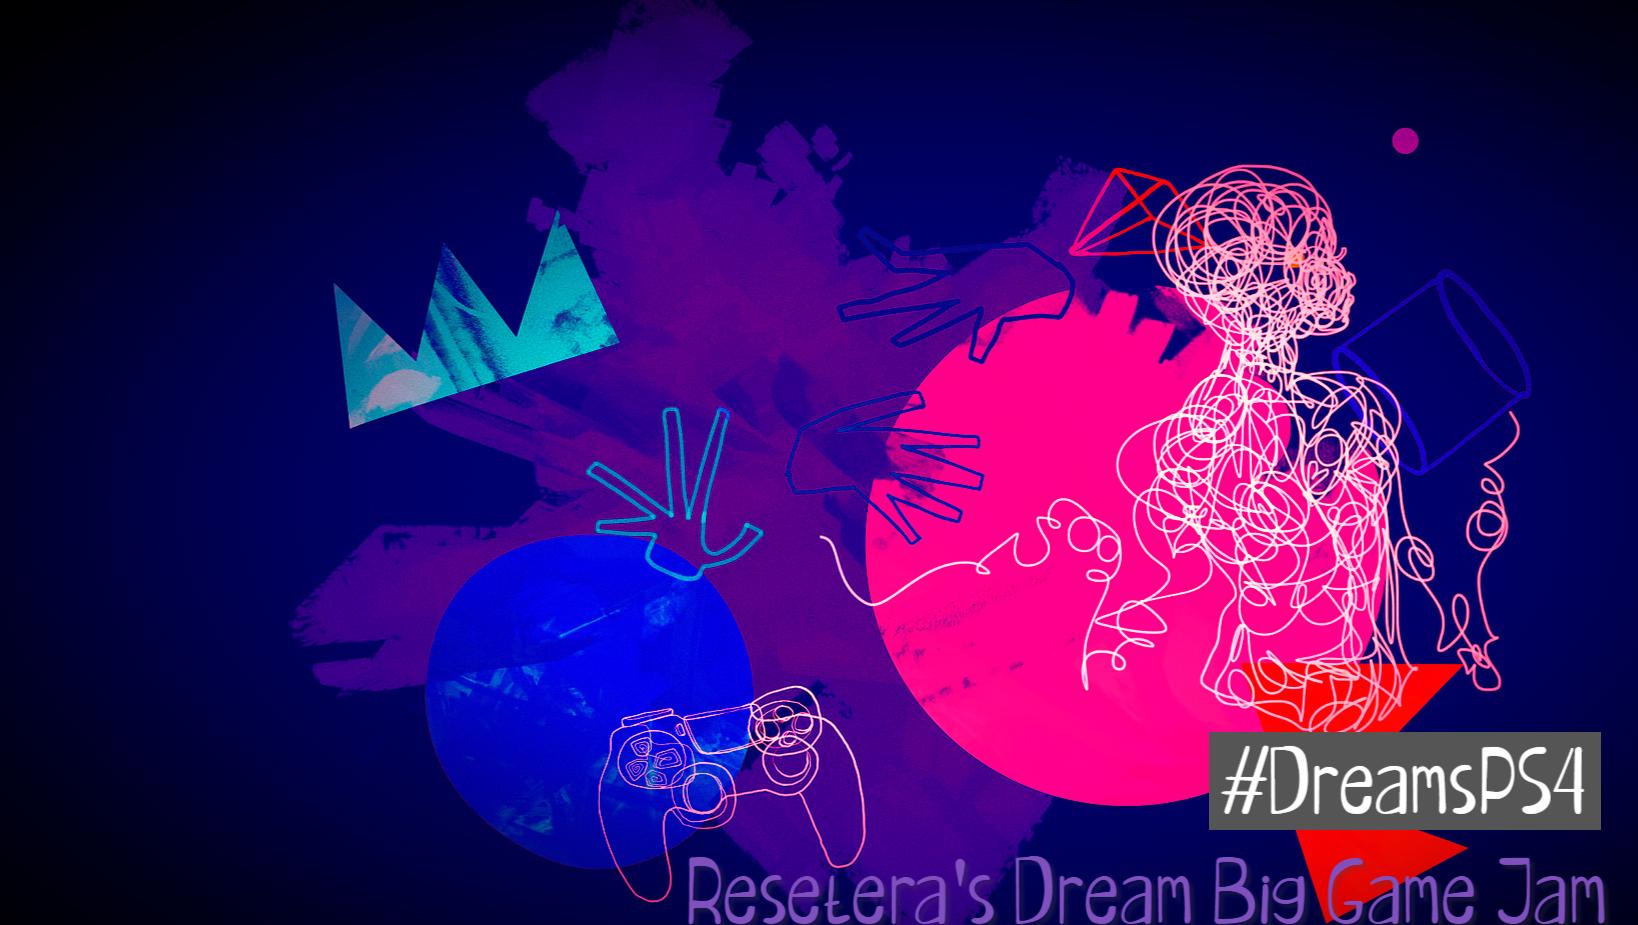 DreamsPS4 48Hr Game Jam | Win A copy of Dreams for PS4